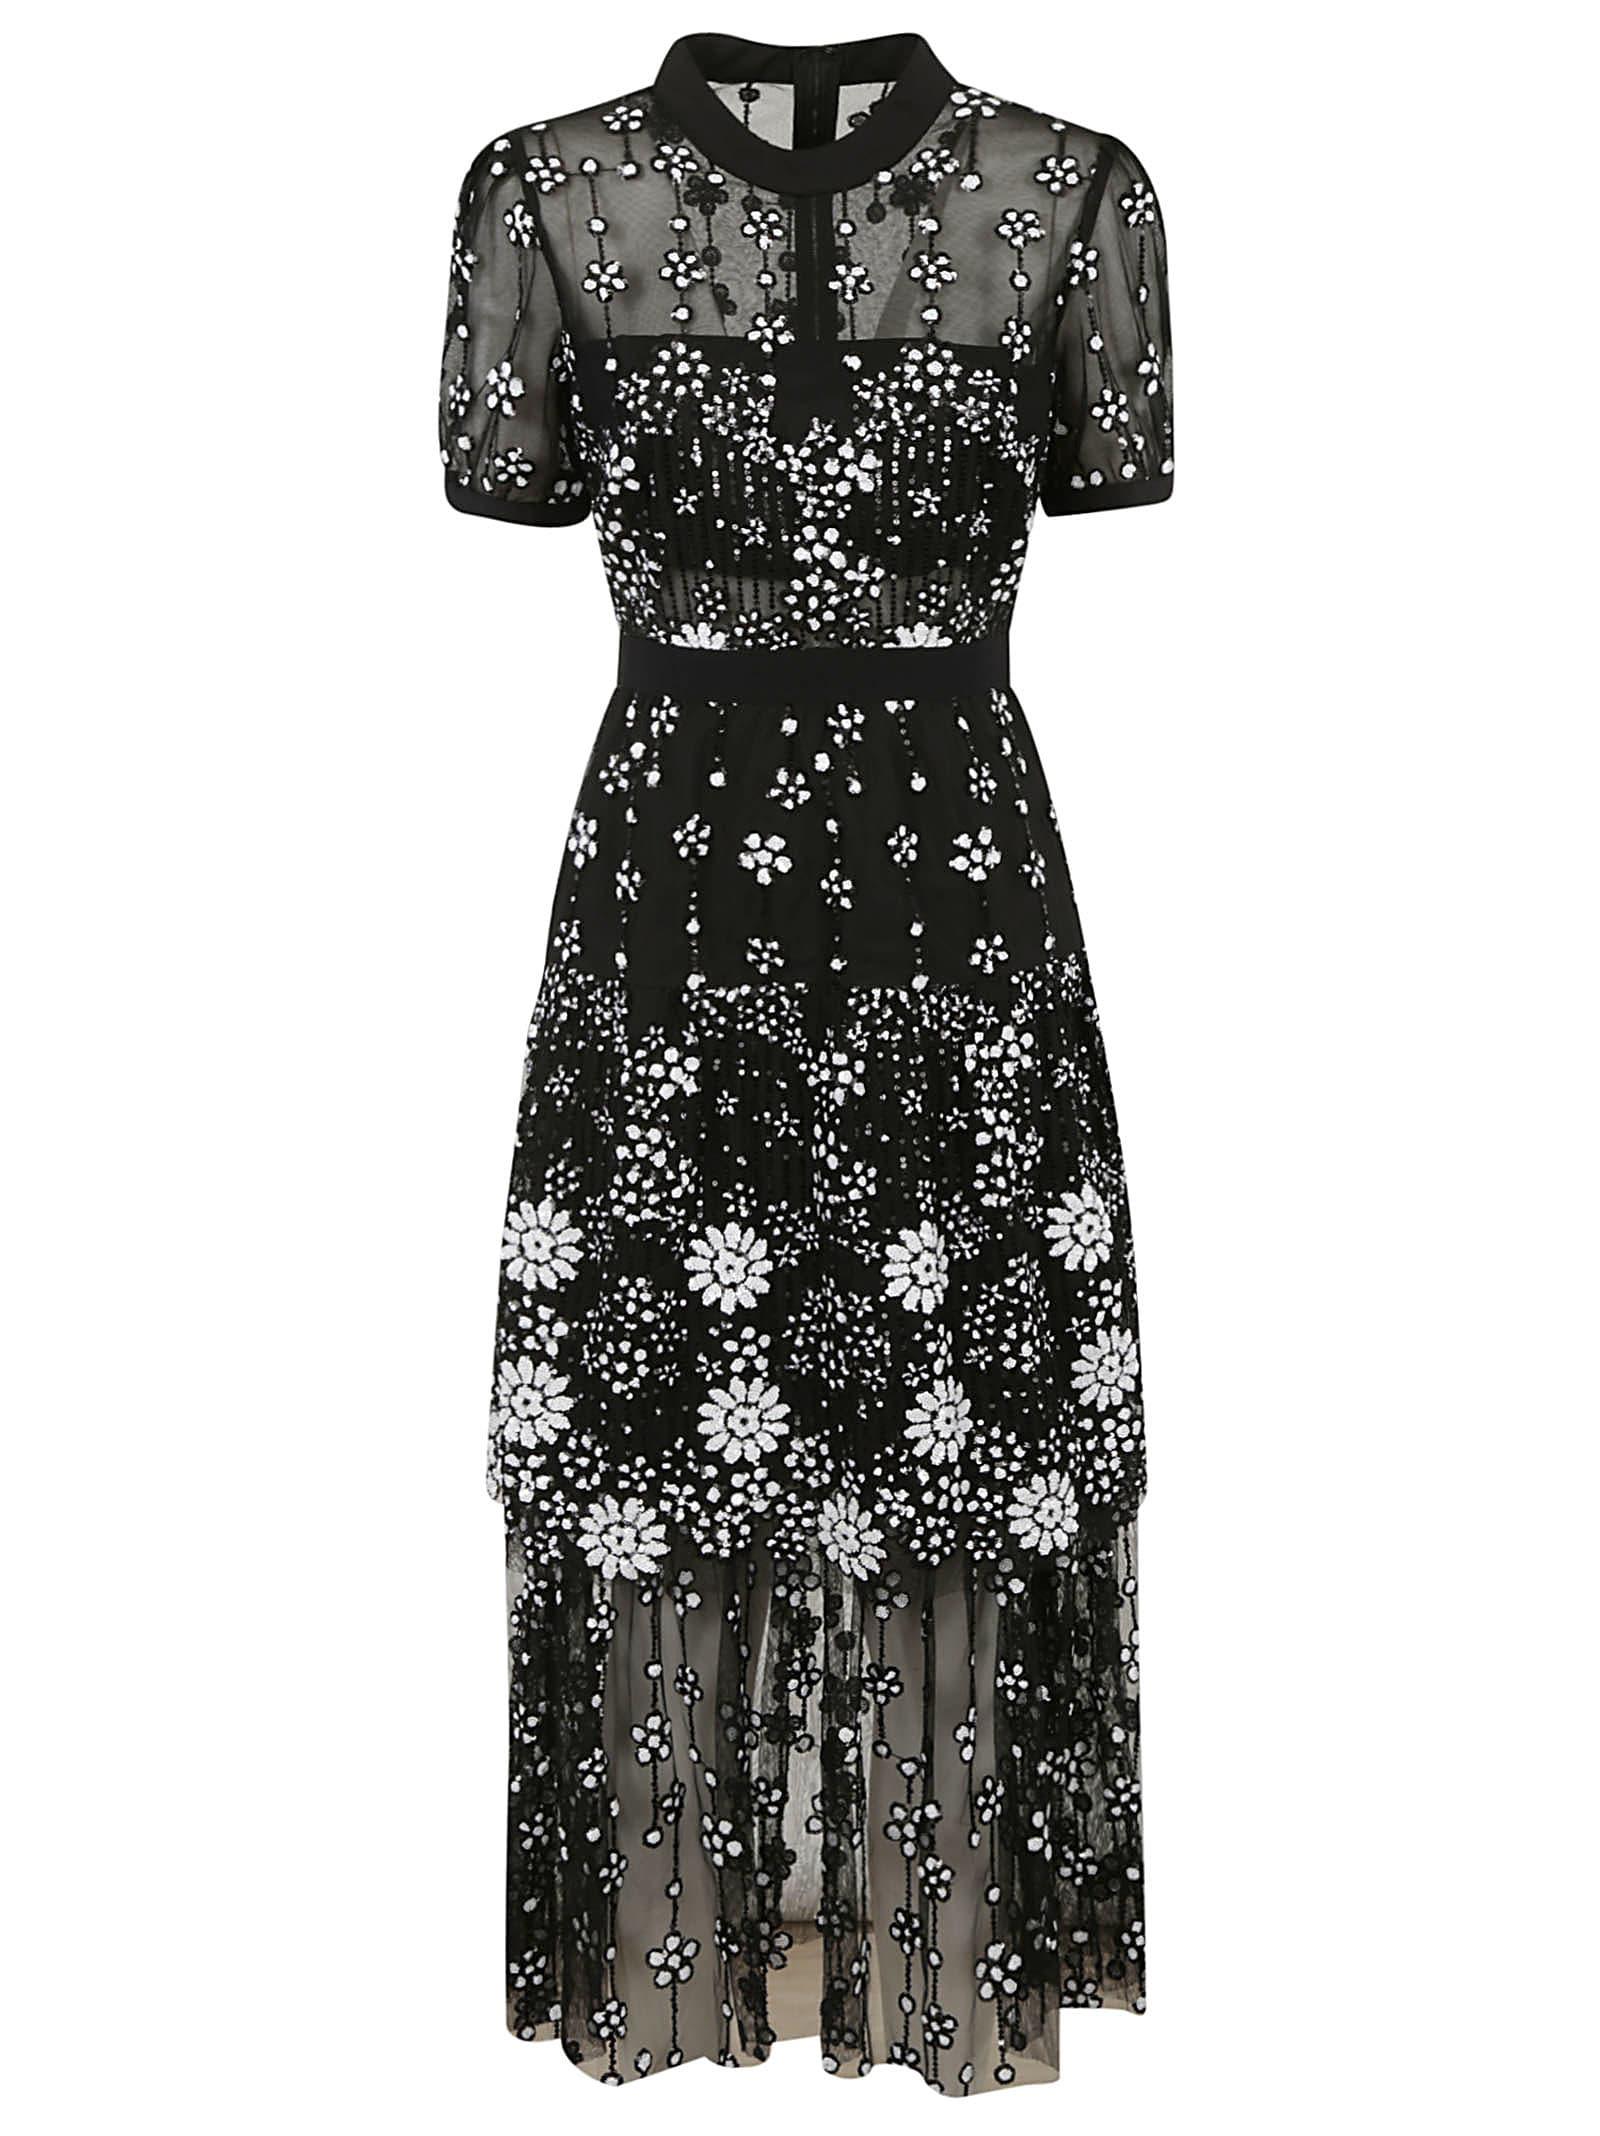 Buy self-portrait Deco Sequin Crew Neck Midi Dress online, shop self-portrait with free shipping